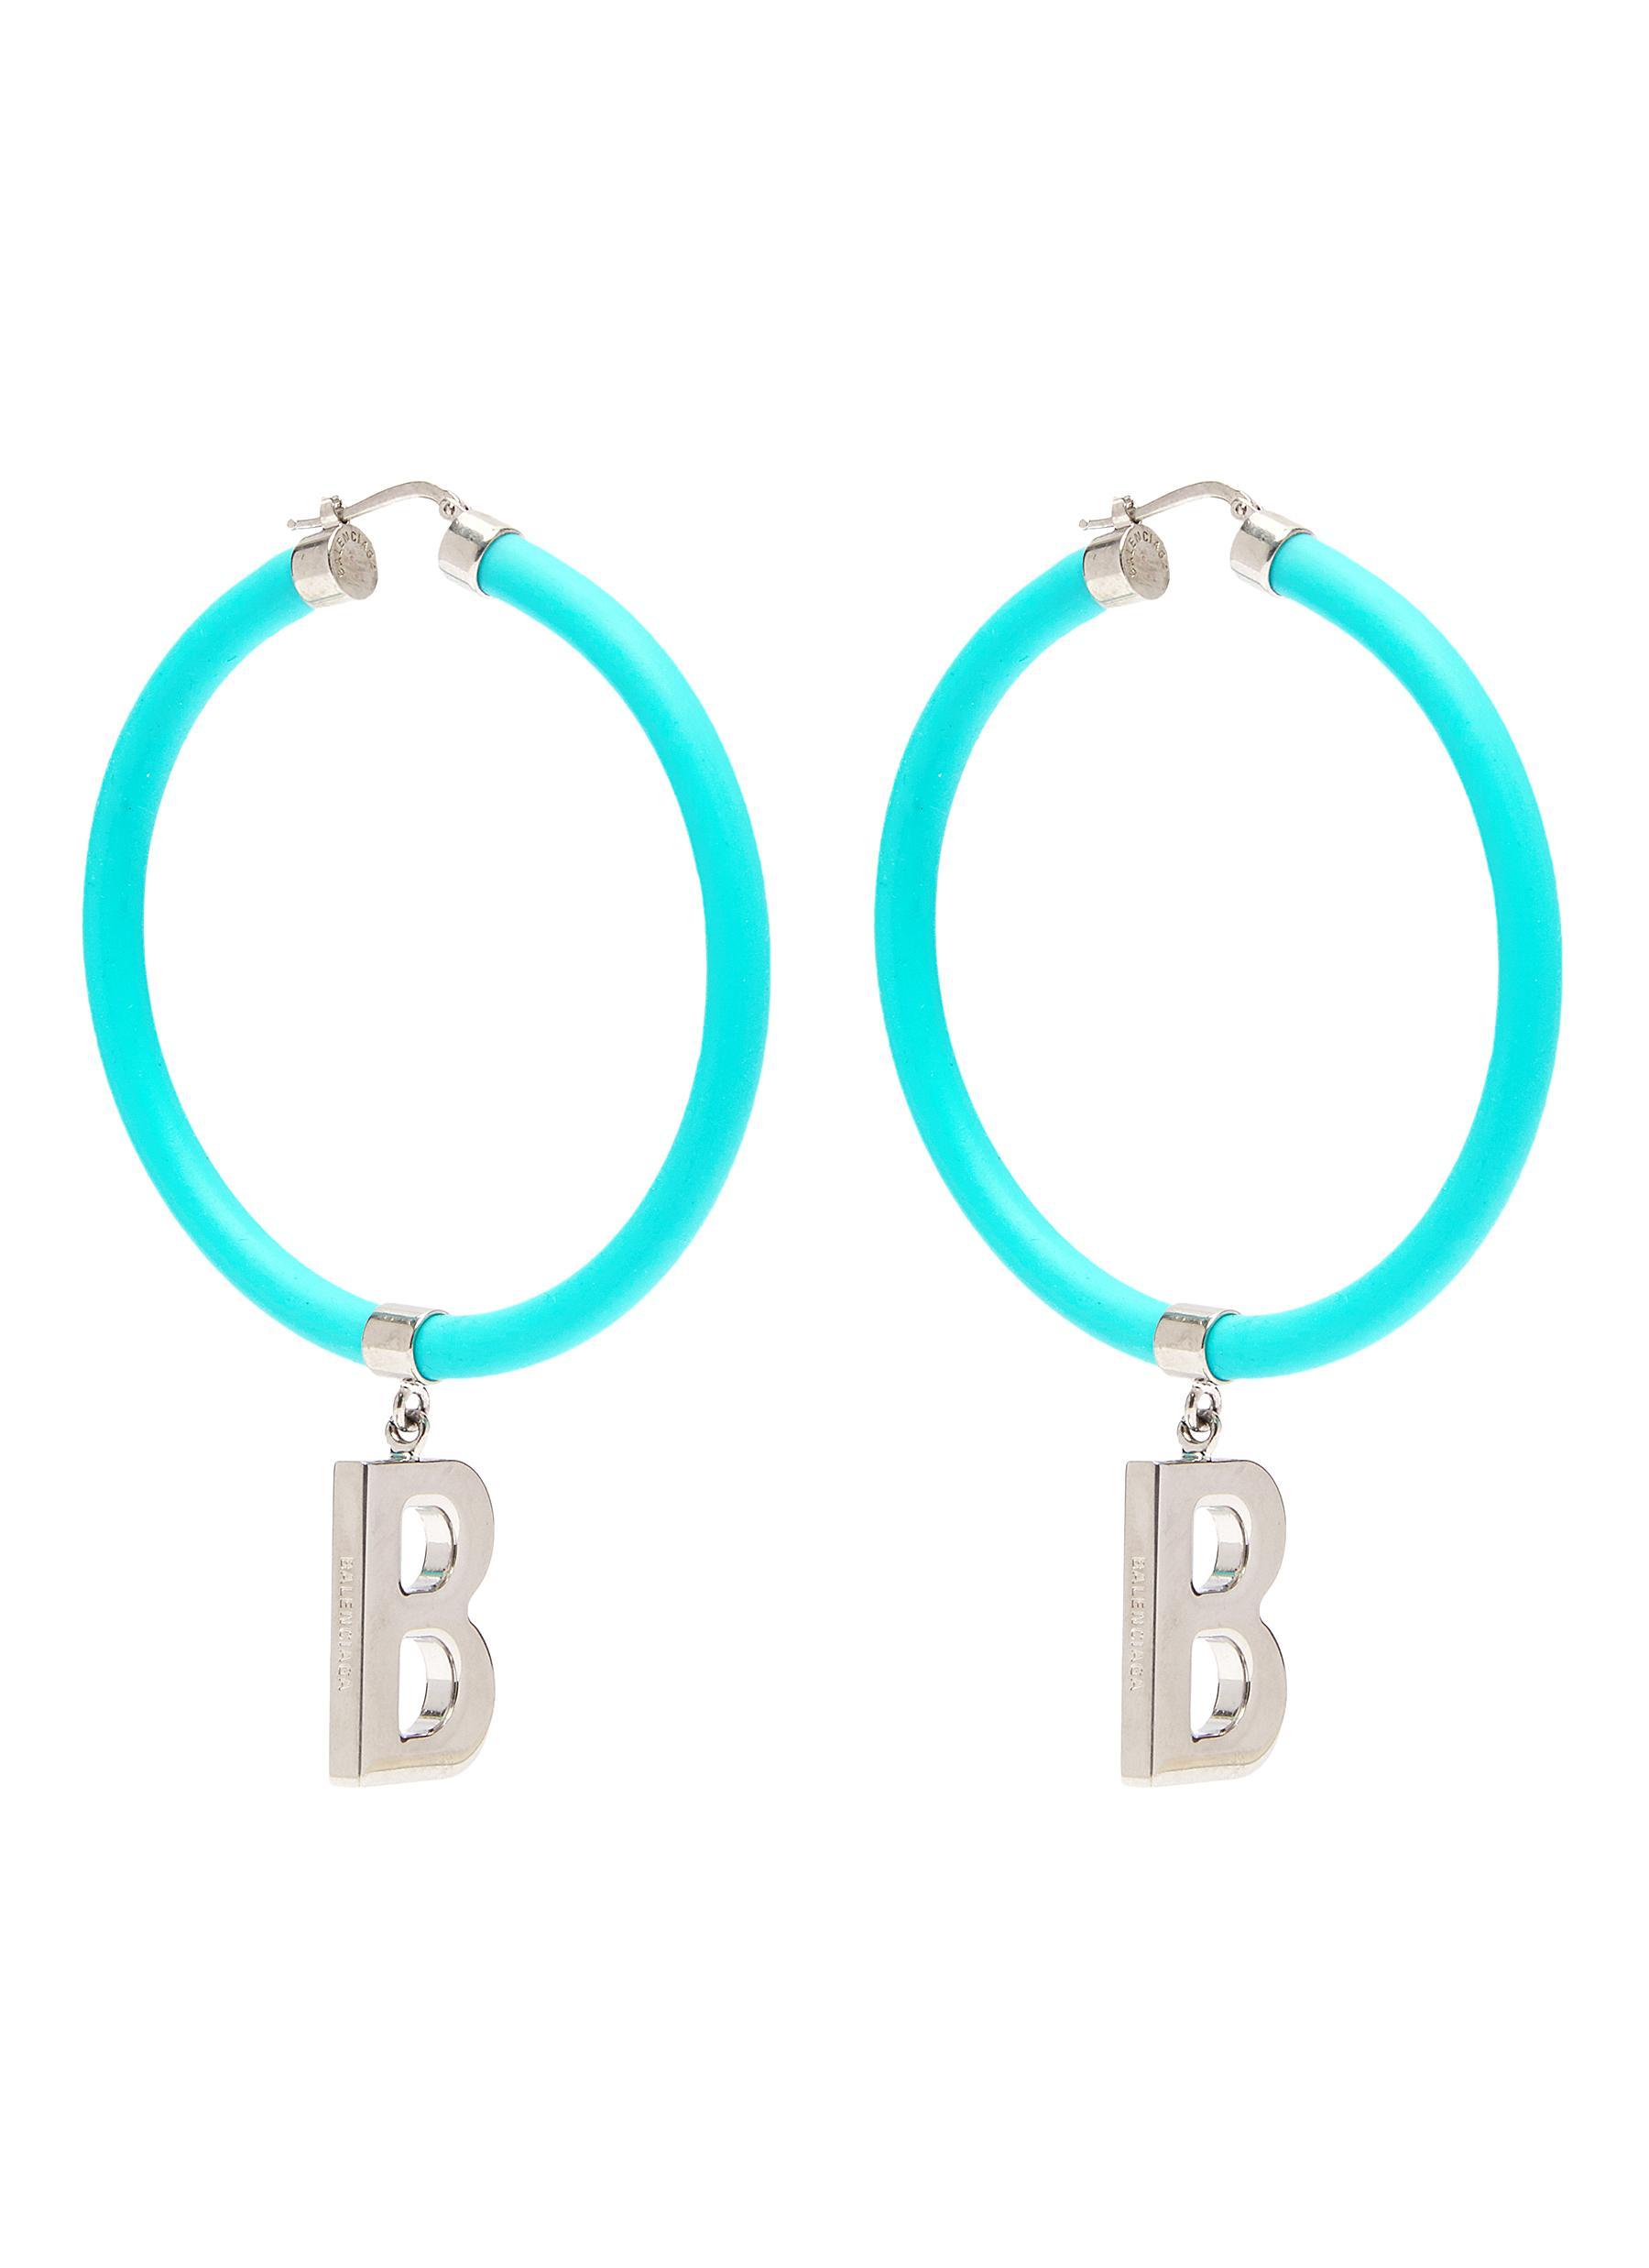 Balenciaga Elastic Band Earrings In Blue